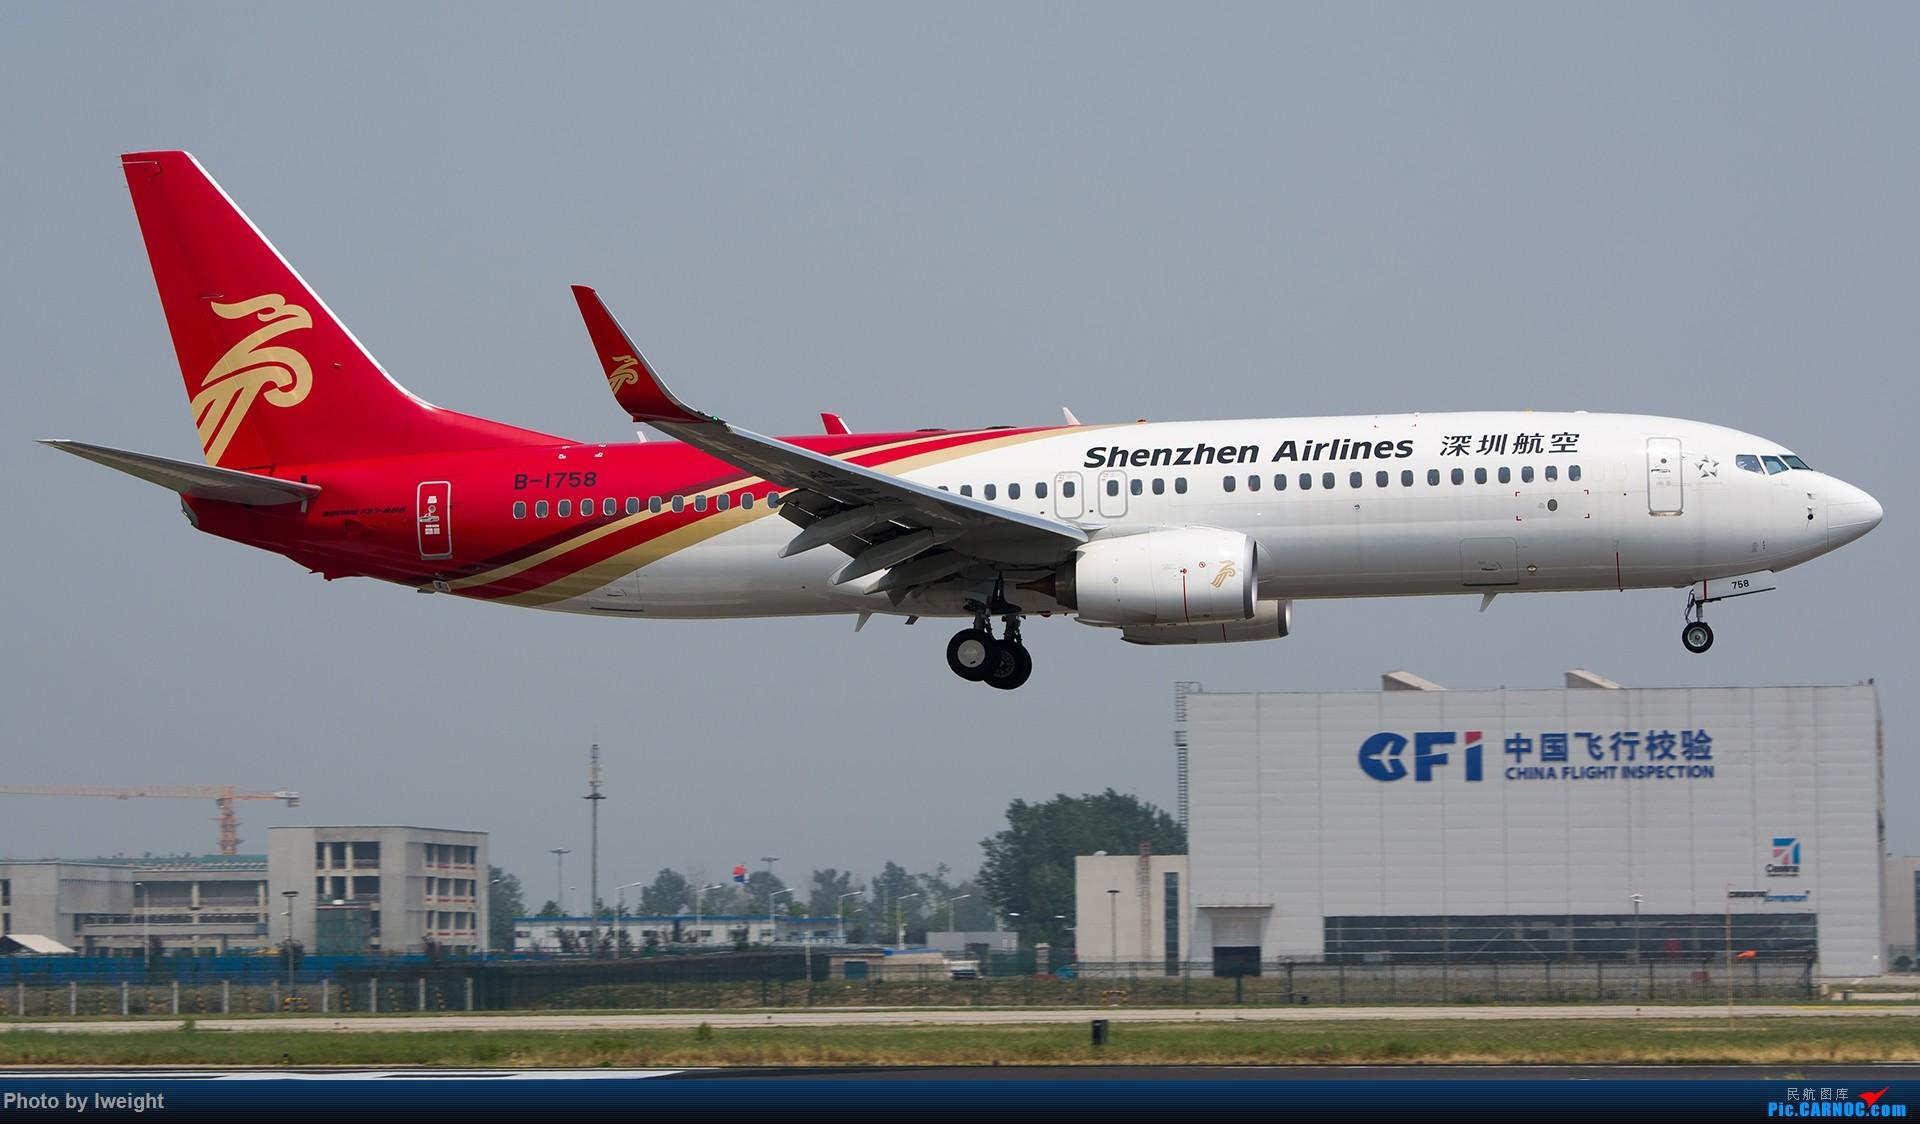 Re:[原创]周末帝都霾天拍机,凑合看看吧【2015-5-23】 BOEING 737-800 B-1758 中国北京首都国际机场